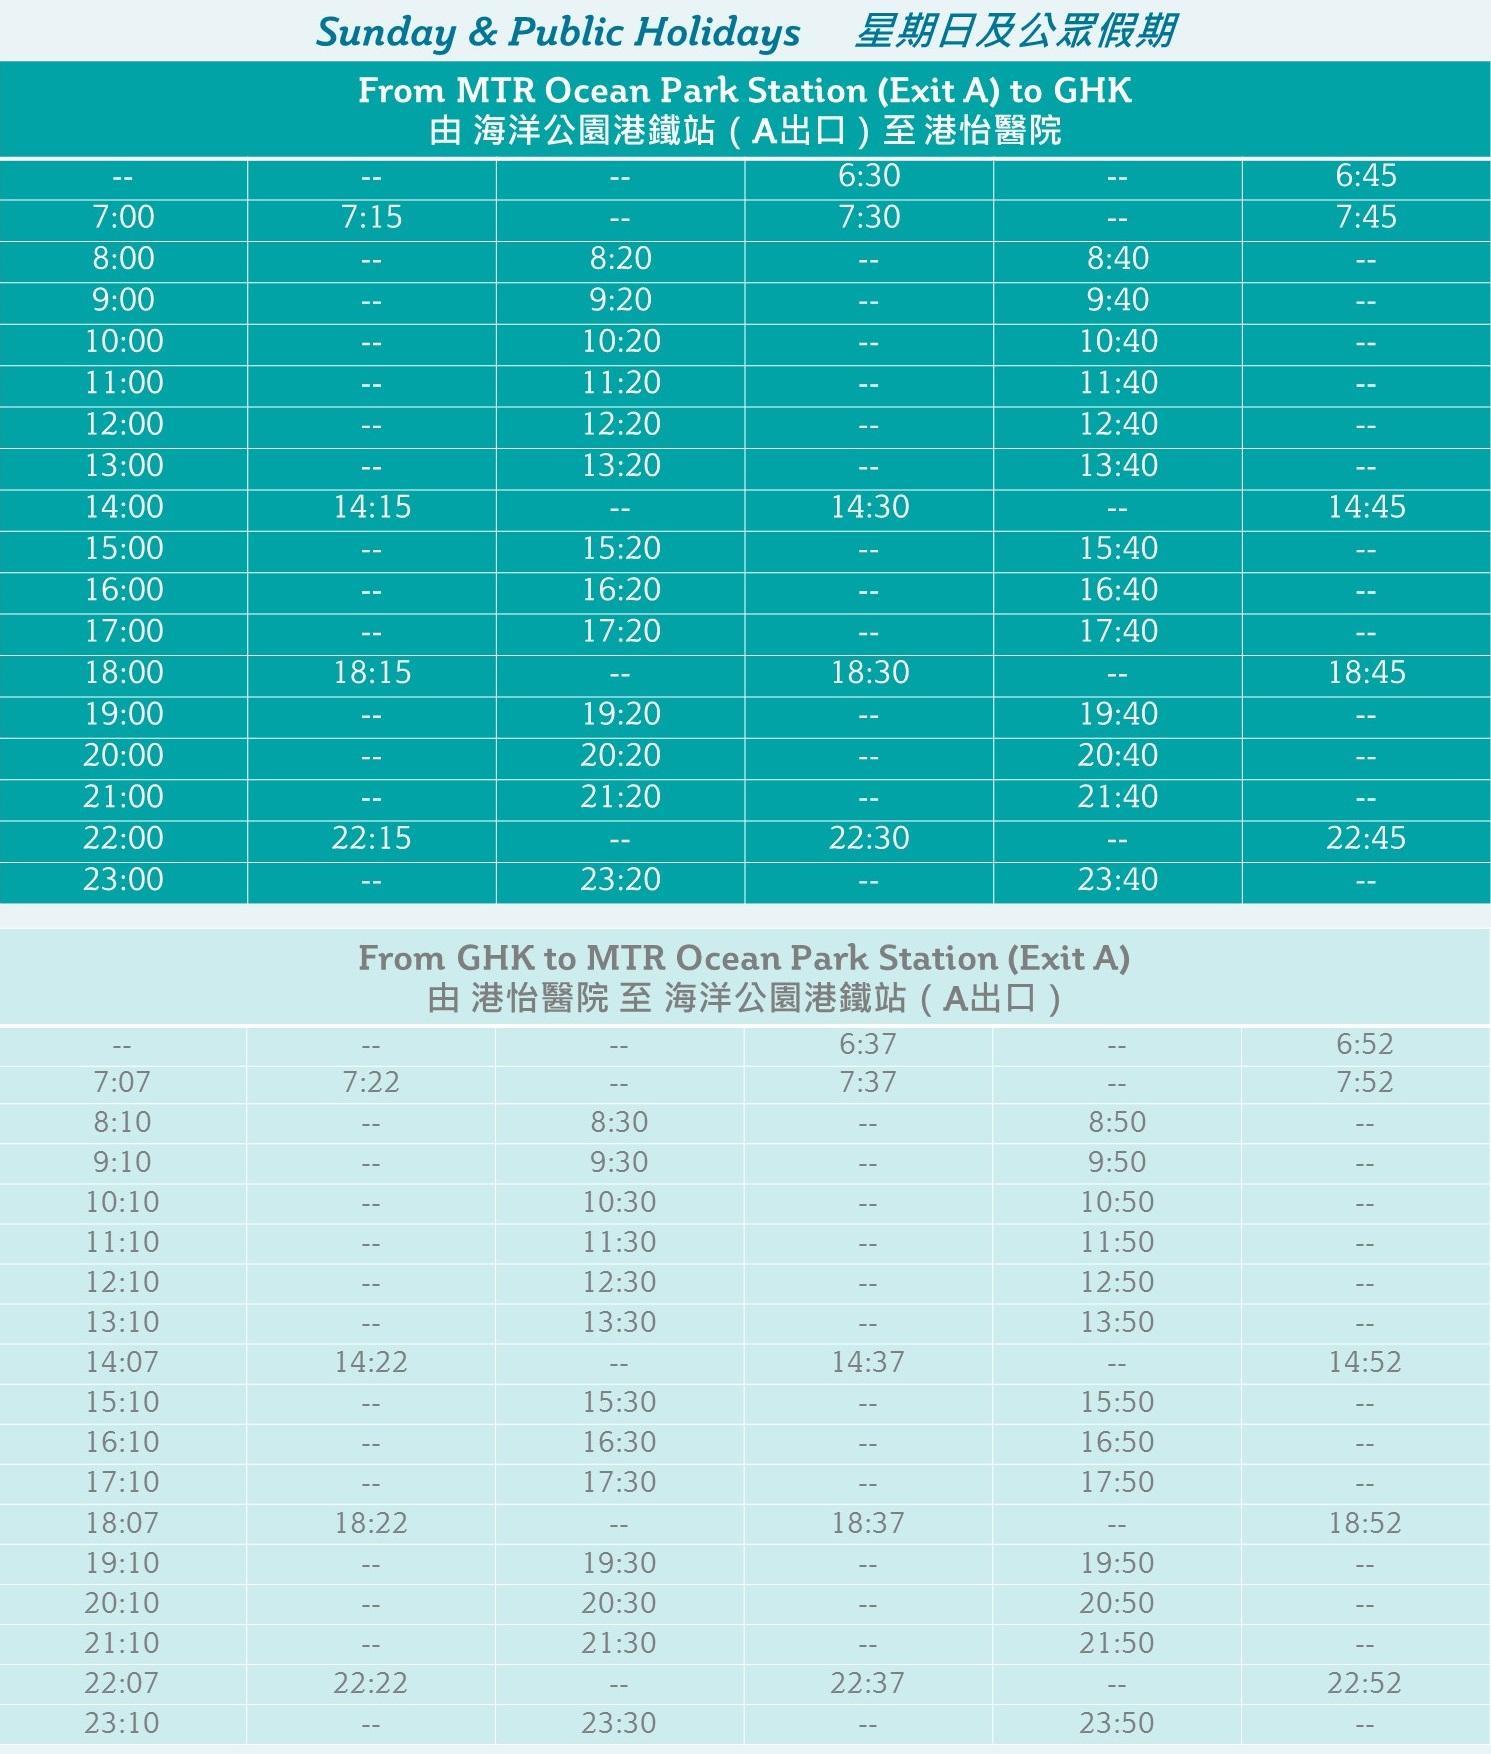 GHK-Free-Suttle-Bus-Schedule_20180801_Sundays-Public-Holidays.JPG#asset:45263